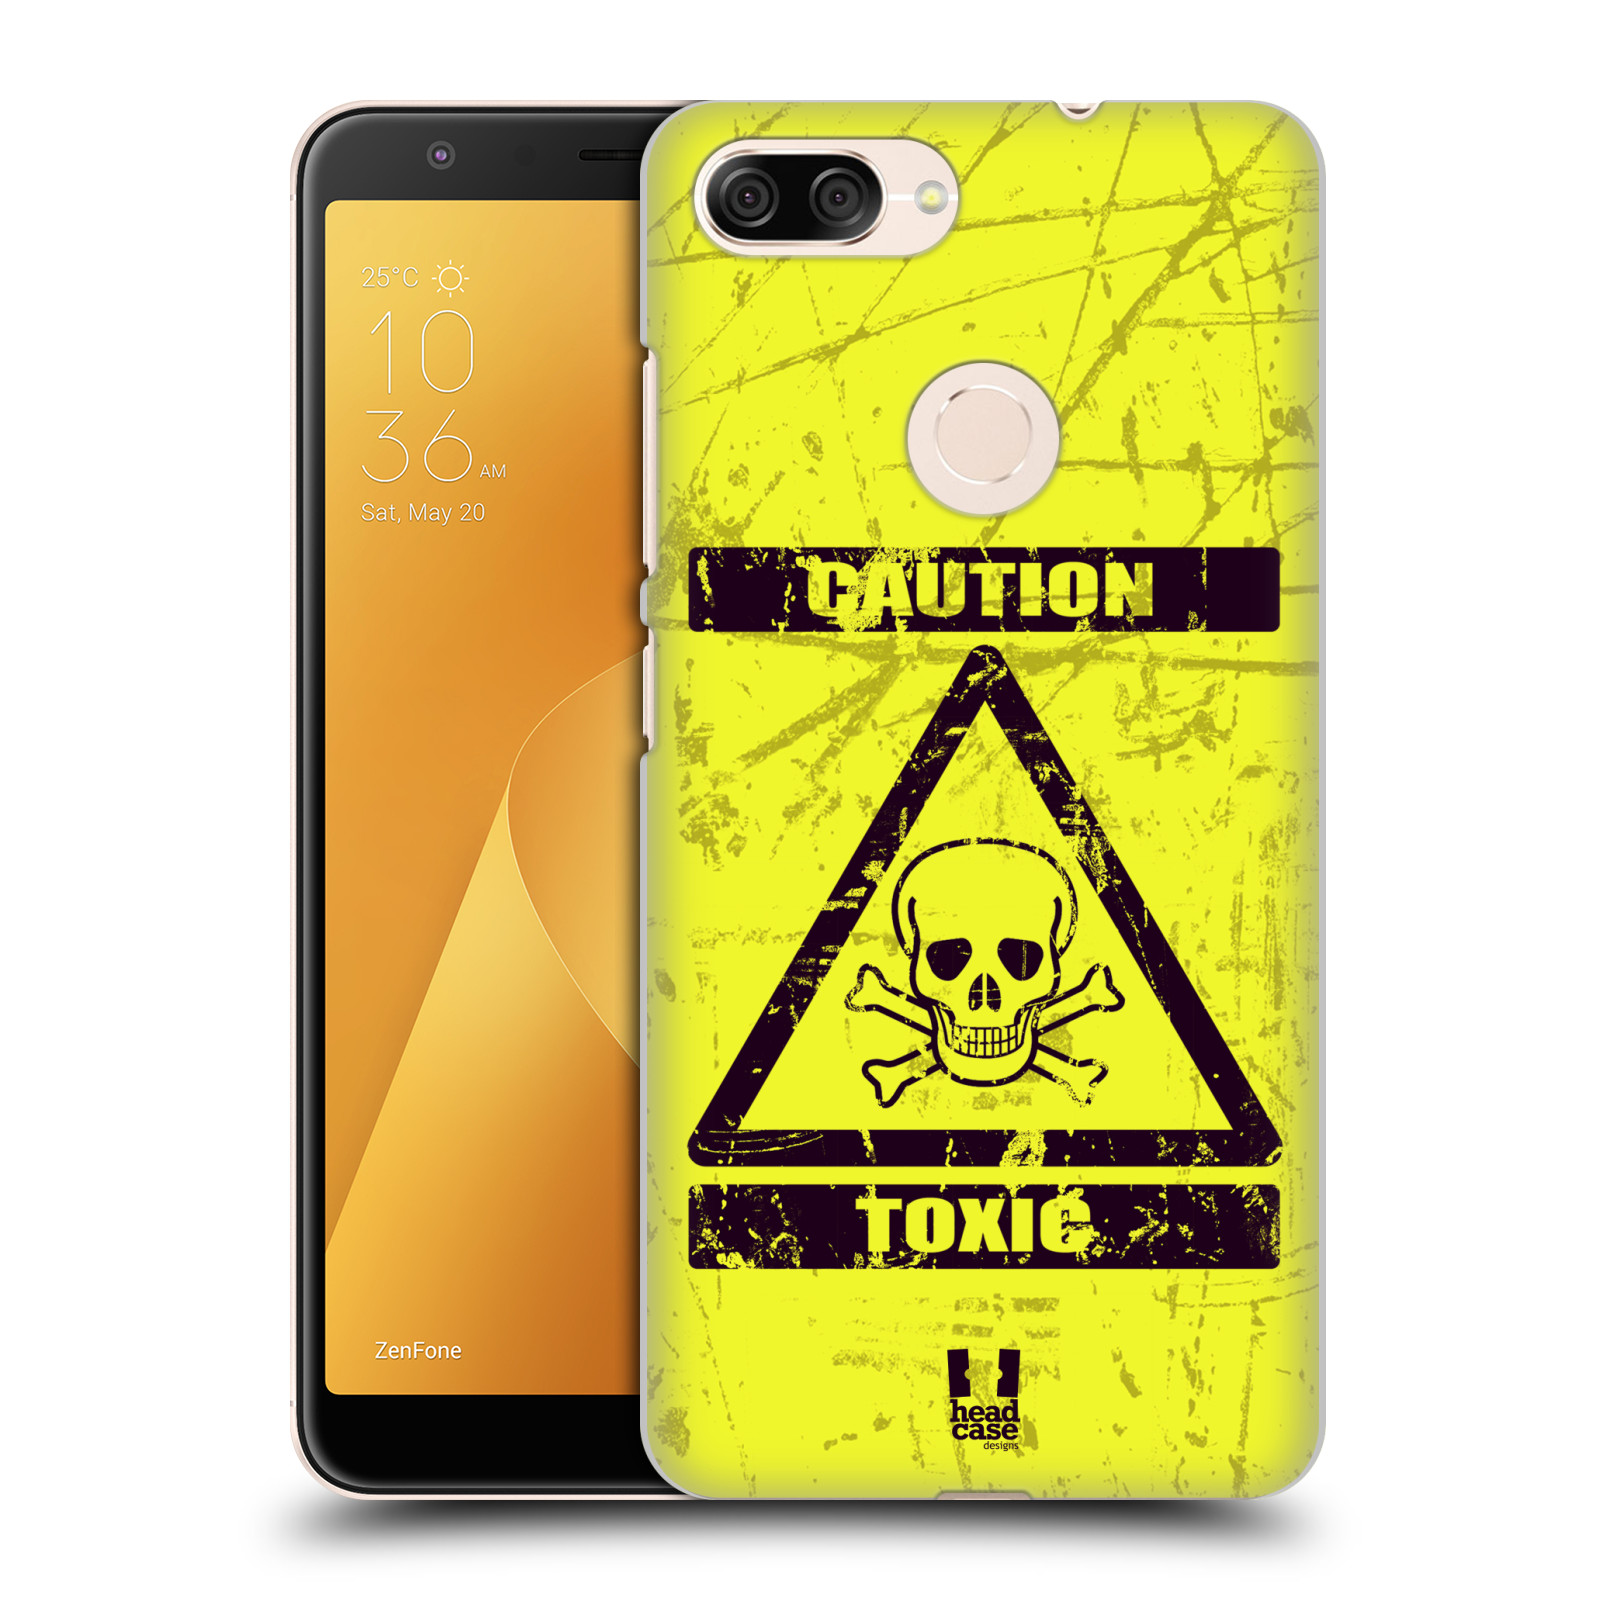 Plastové pouzdro na mobil Asus ZenFone Max Plus (M1) - Head Case - TOXIC (Plastový kryt či obal na mobilní telefon Asus ZenFone Max Plus M1 ZB570TL s motivem TOXIC)